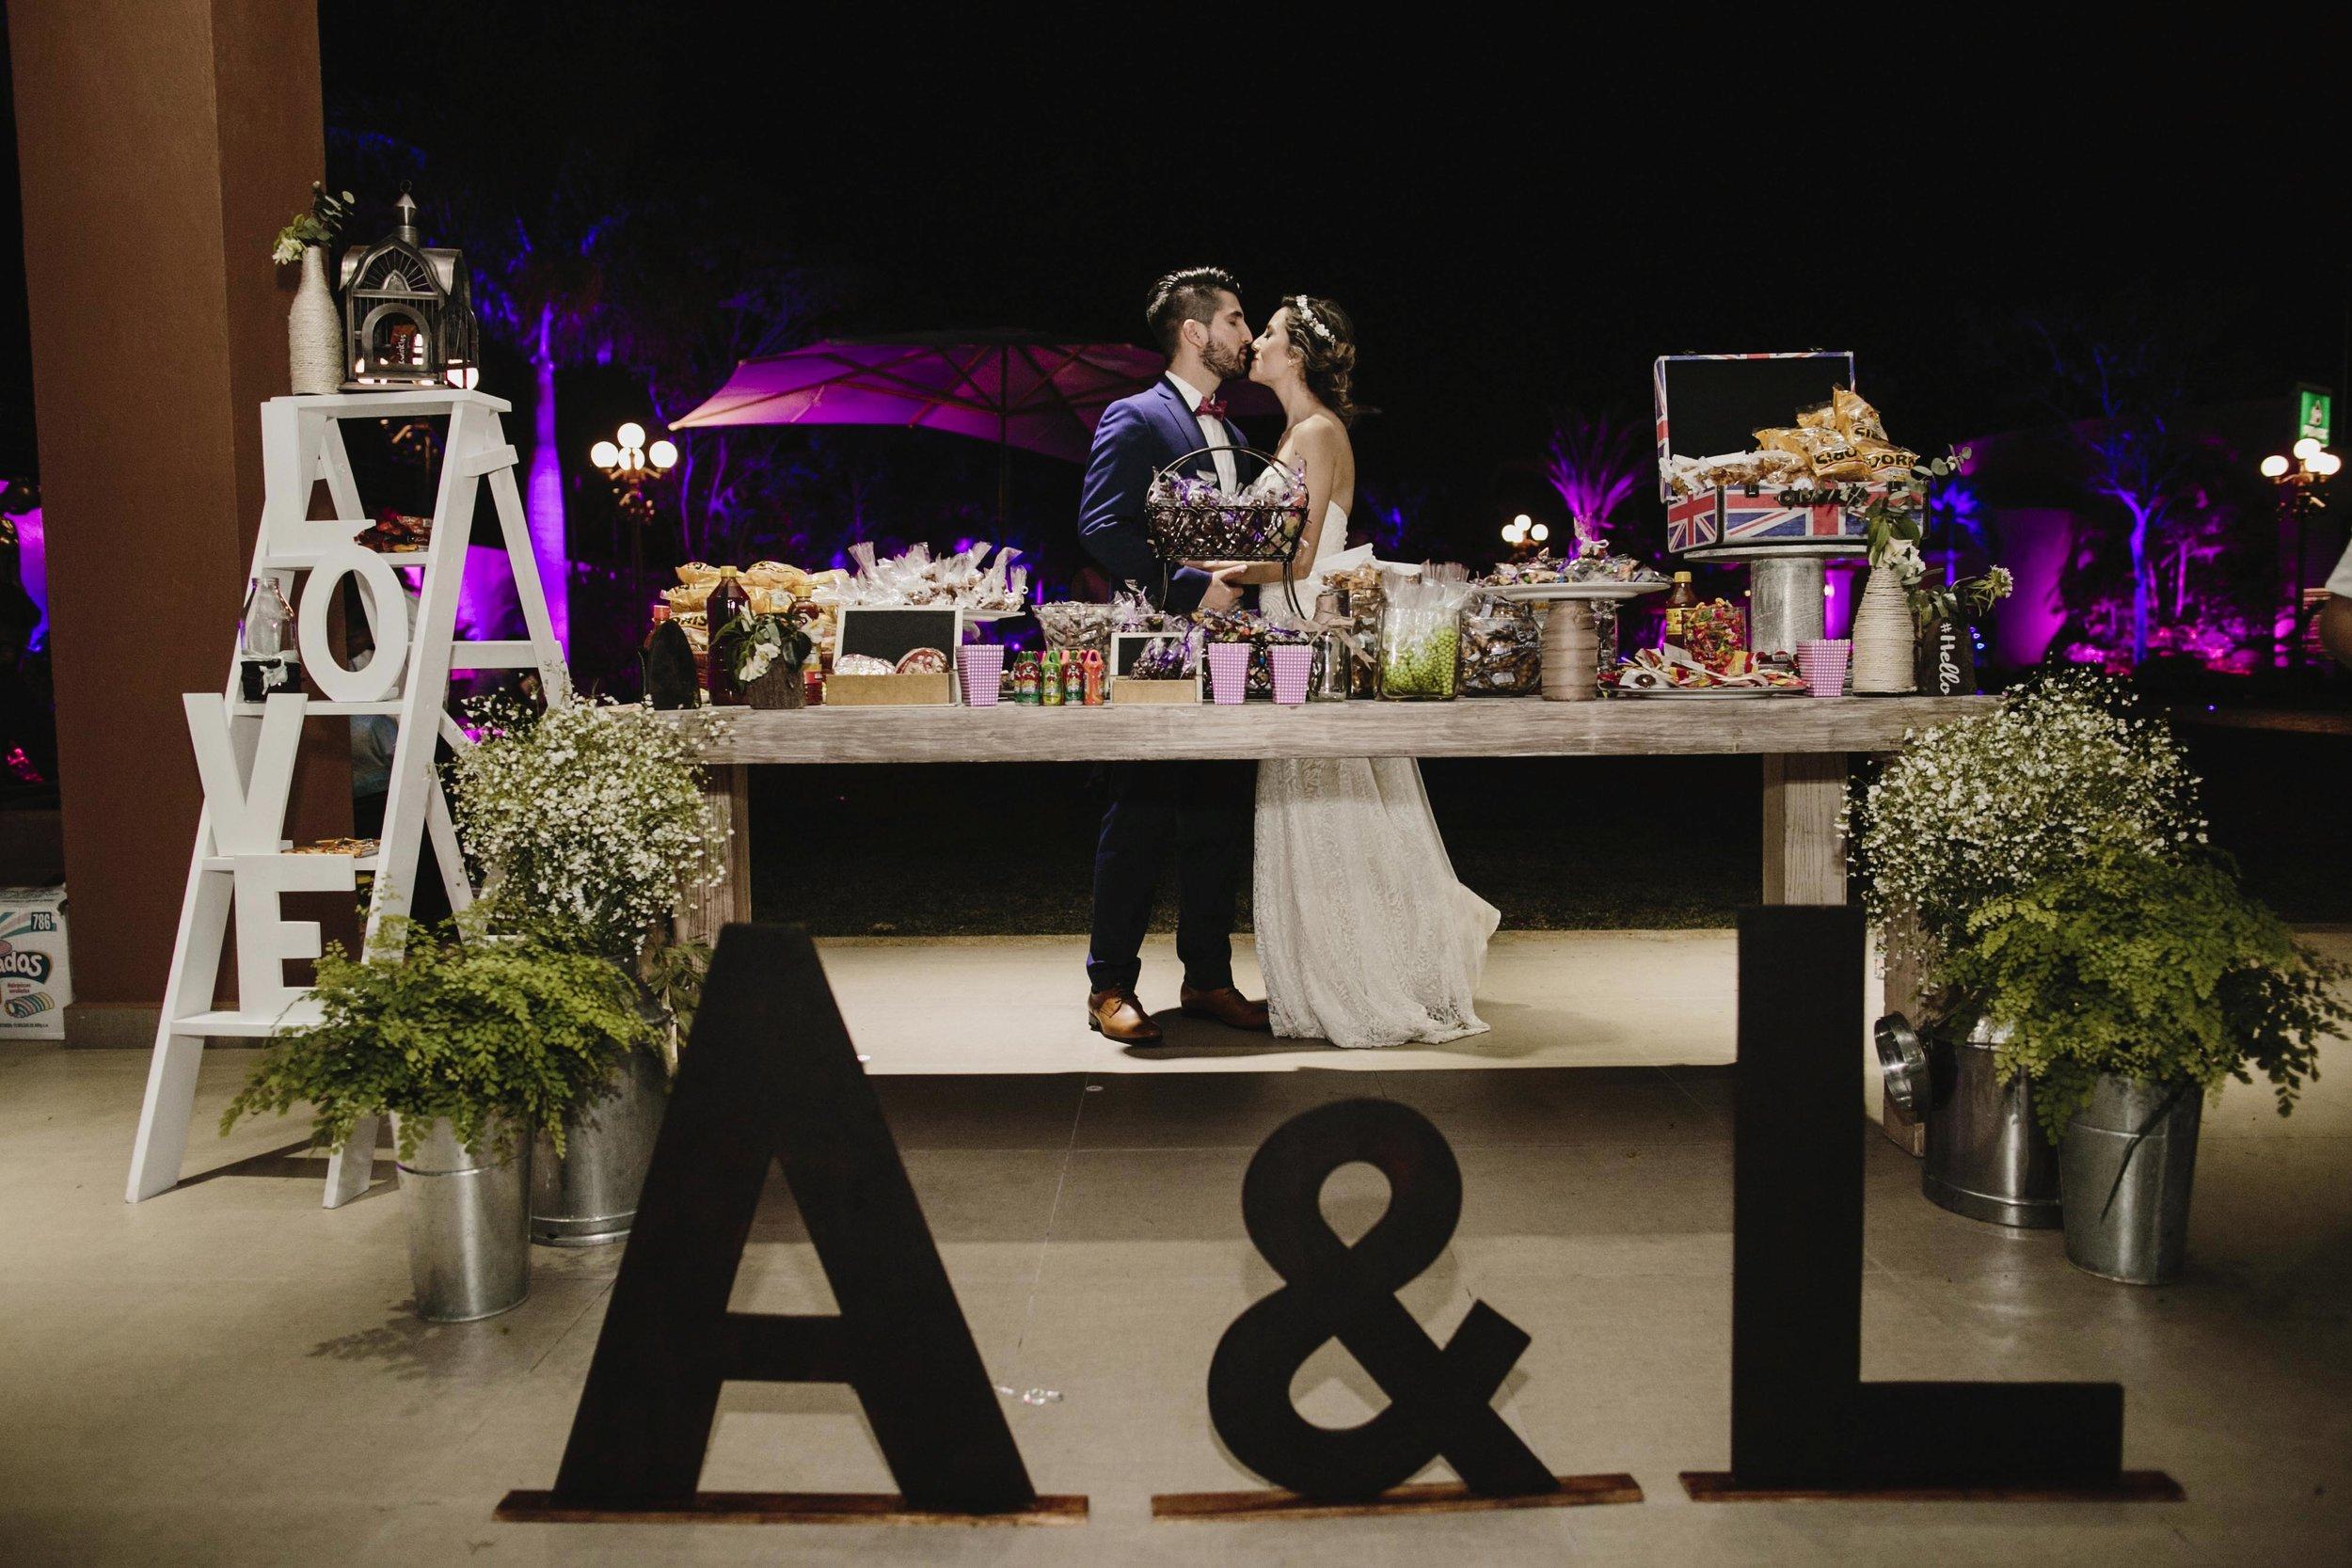 alfonso_flores_destination_wedding_photography_jardin_amarello_cuernavaca6.jpg